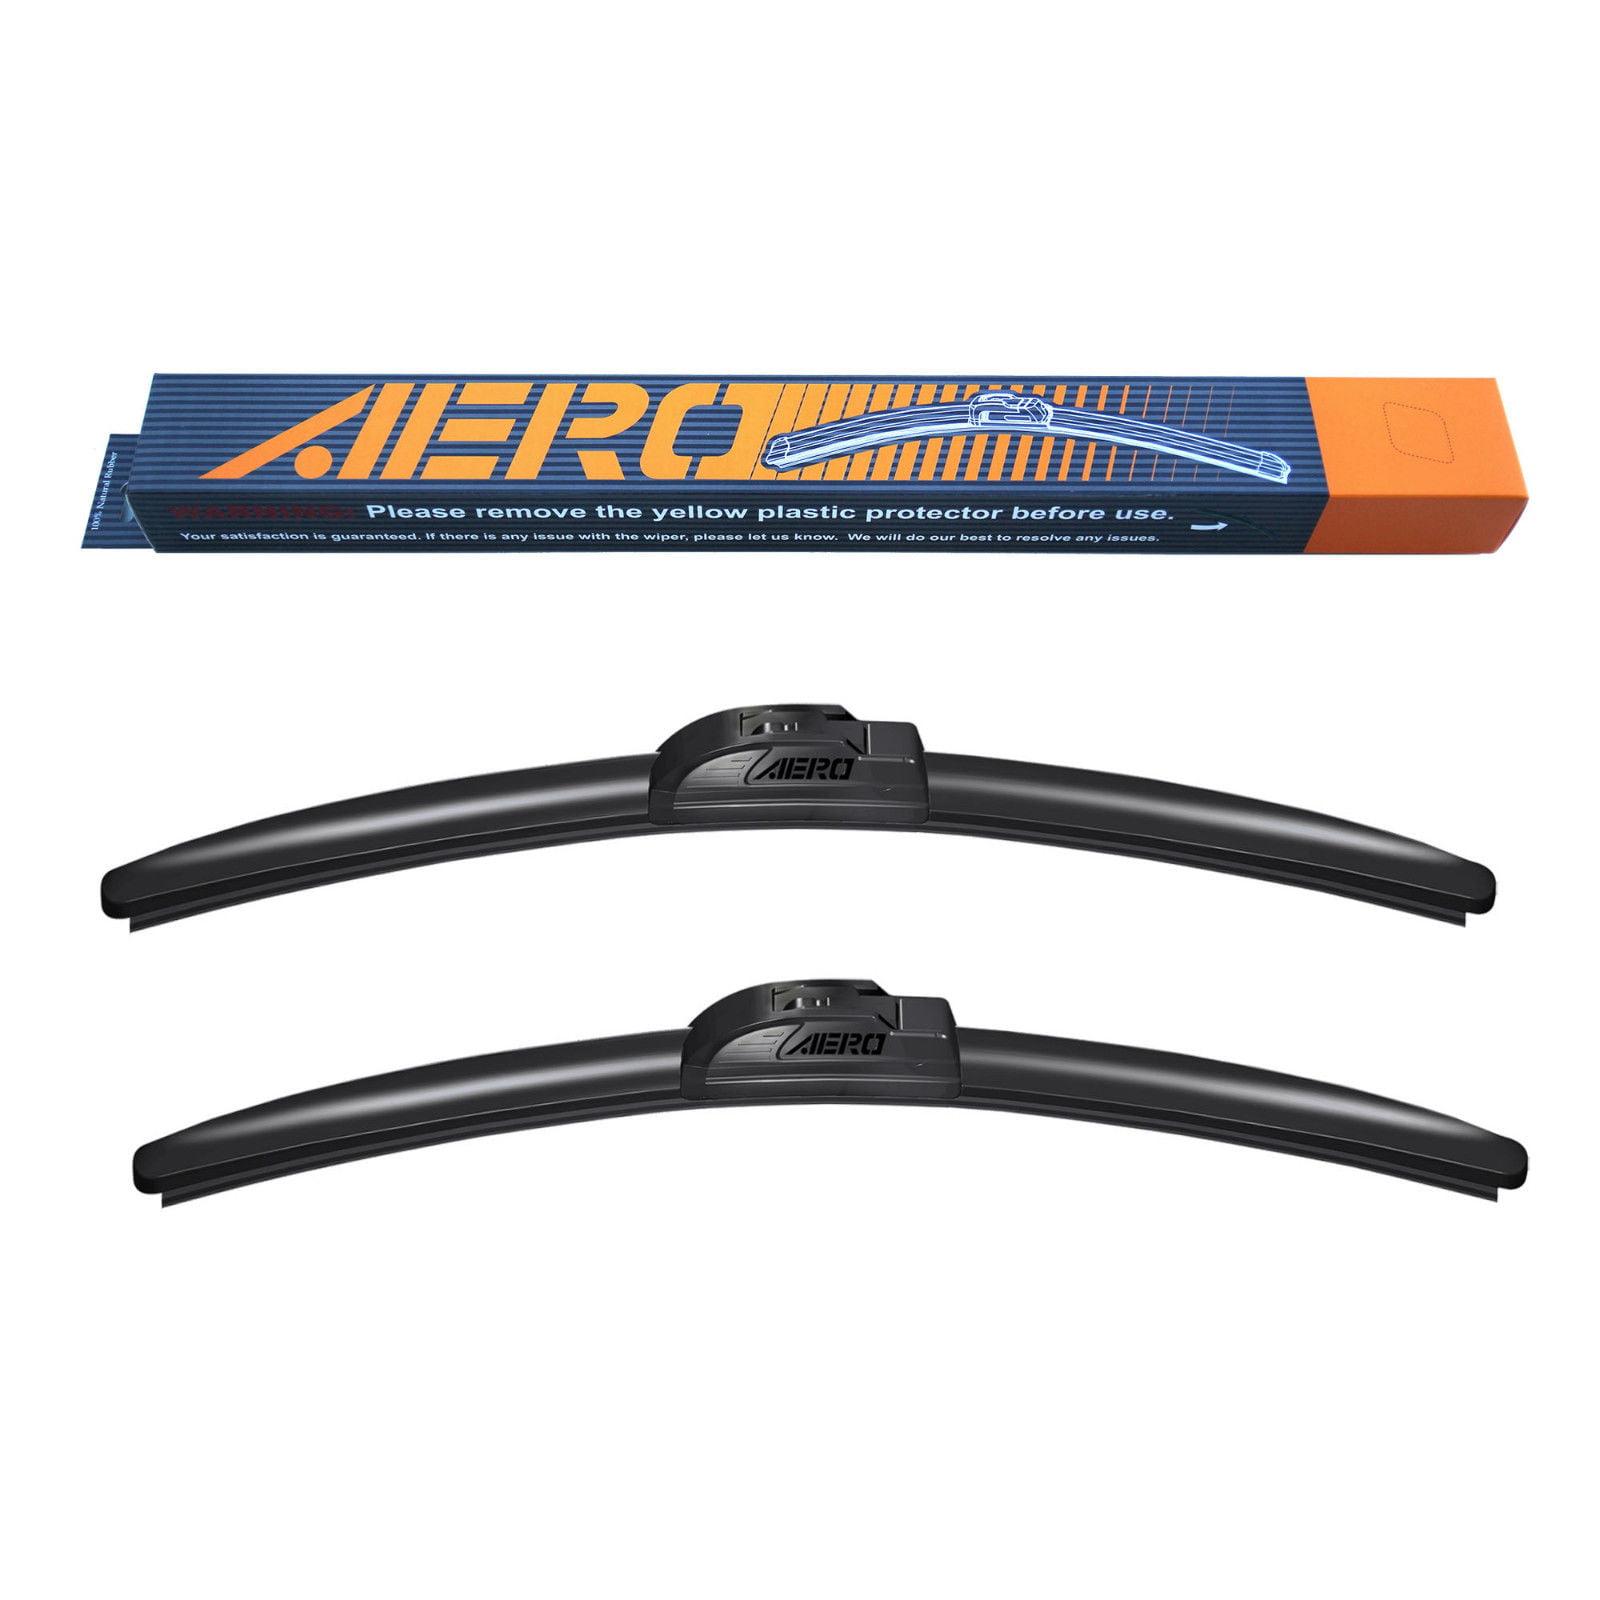 "AERO Voyager 24"" + 24"" All-Season Beam Windshield Wiper Blades (Set of 2)"